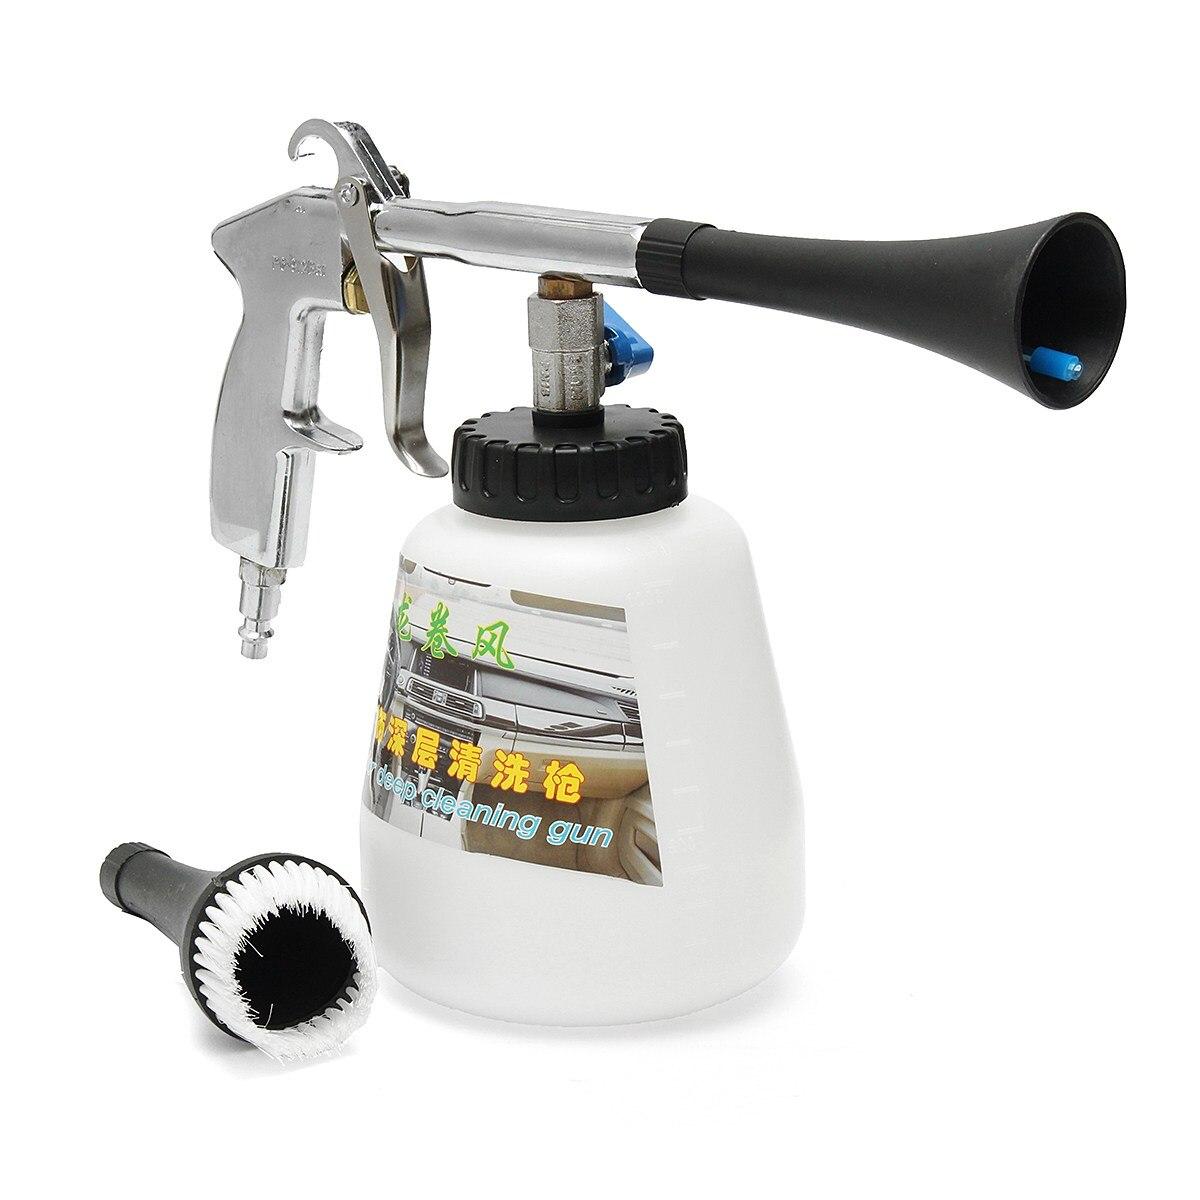 car wash equipment for tornador z 010 z 020 interior deep cleaning gun and brush for cockpit. Black Bedroom Furniture Sets. Home Design Ideas